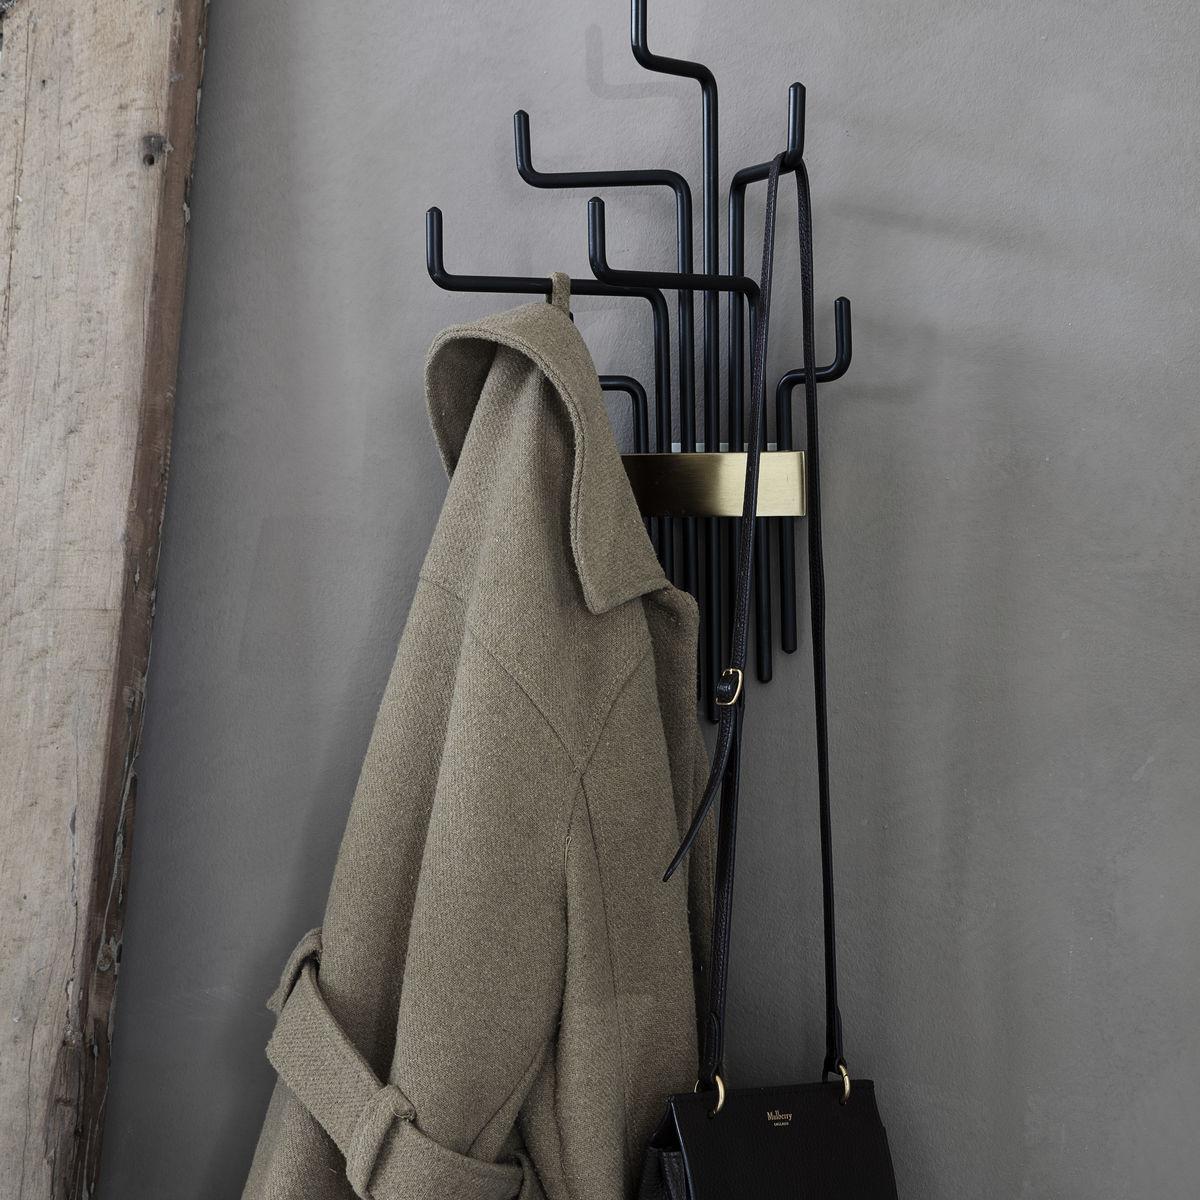 Society of Lifestyle coat rack, Pipes, black